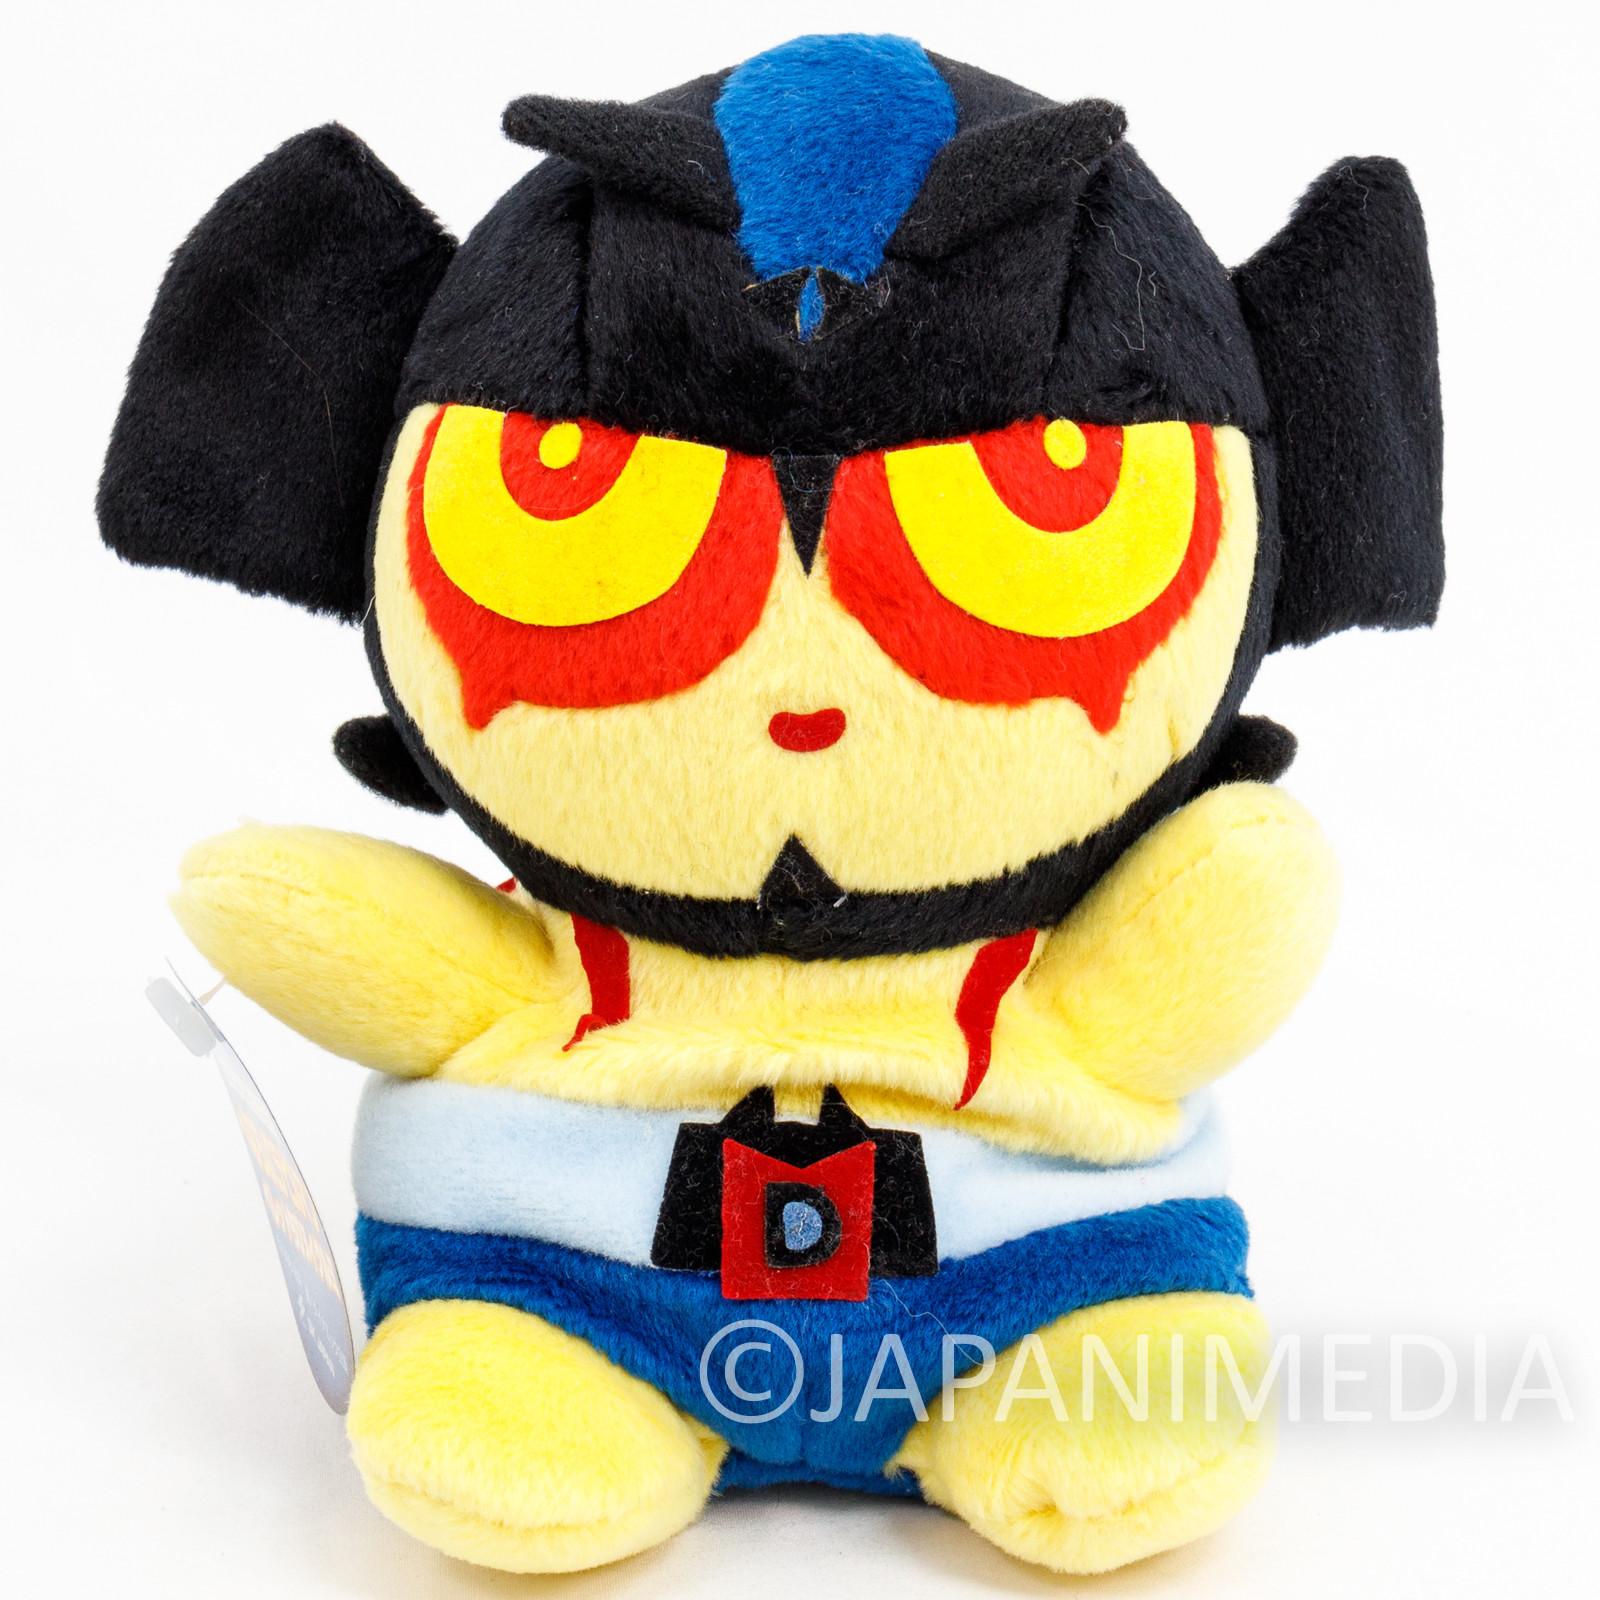 "Devilman Pellet Filled Plush Doll 6"" Yellow SK Japan JAPAN ANIME"